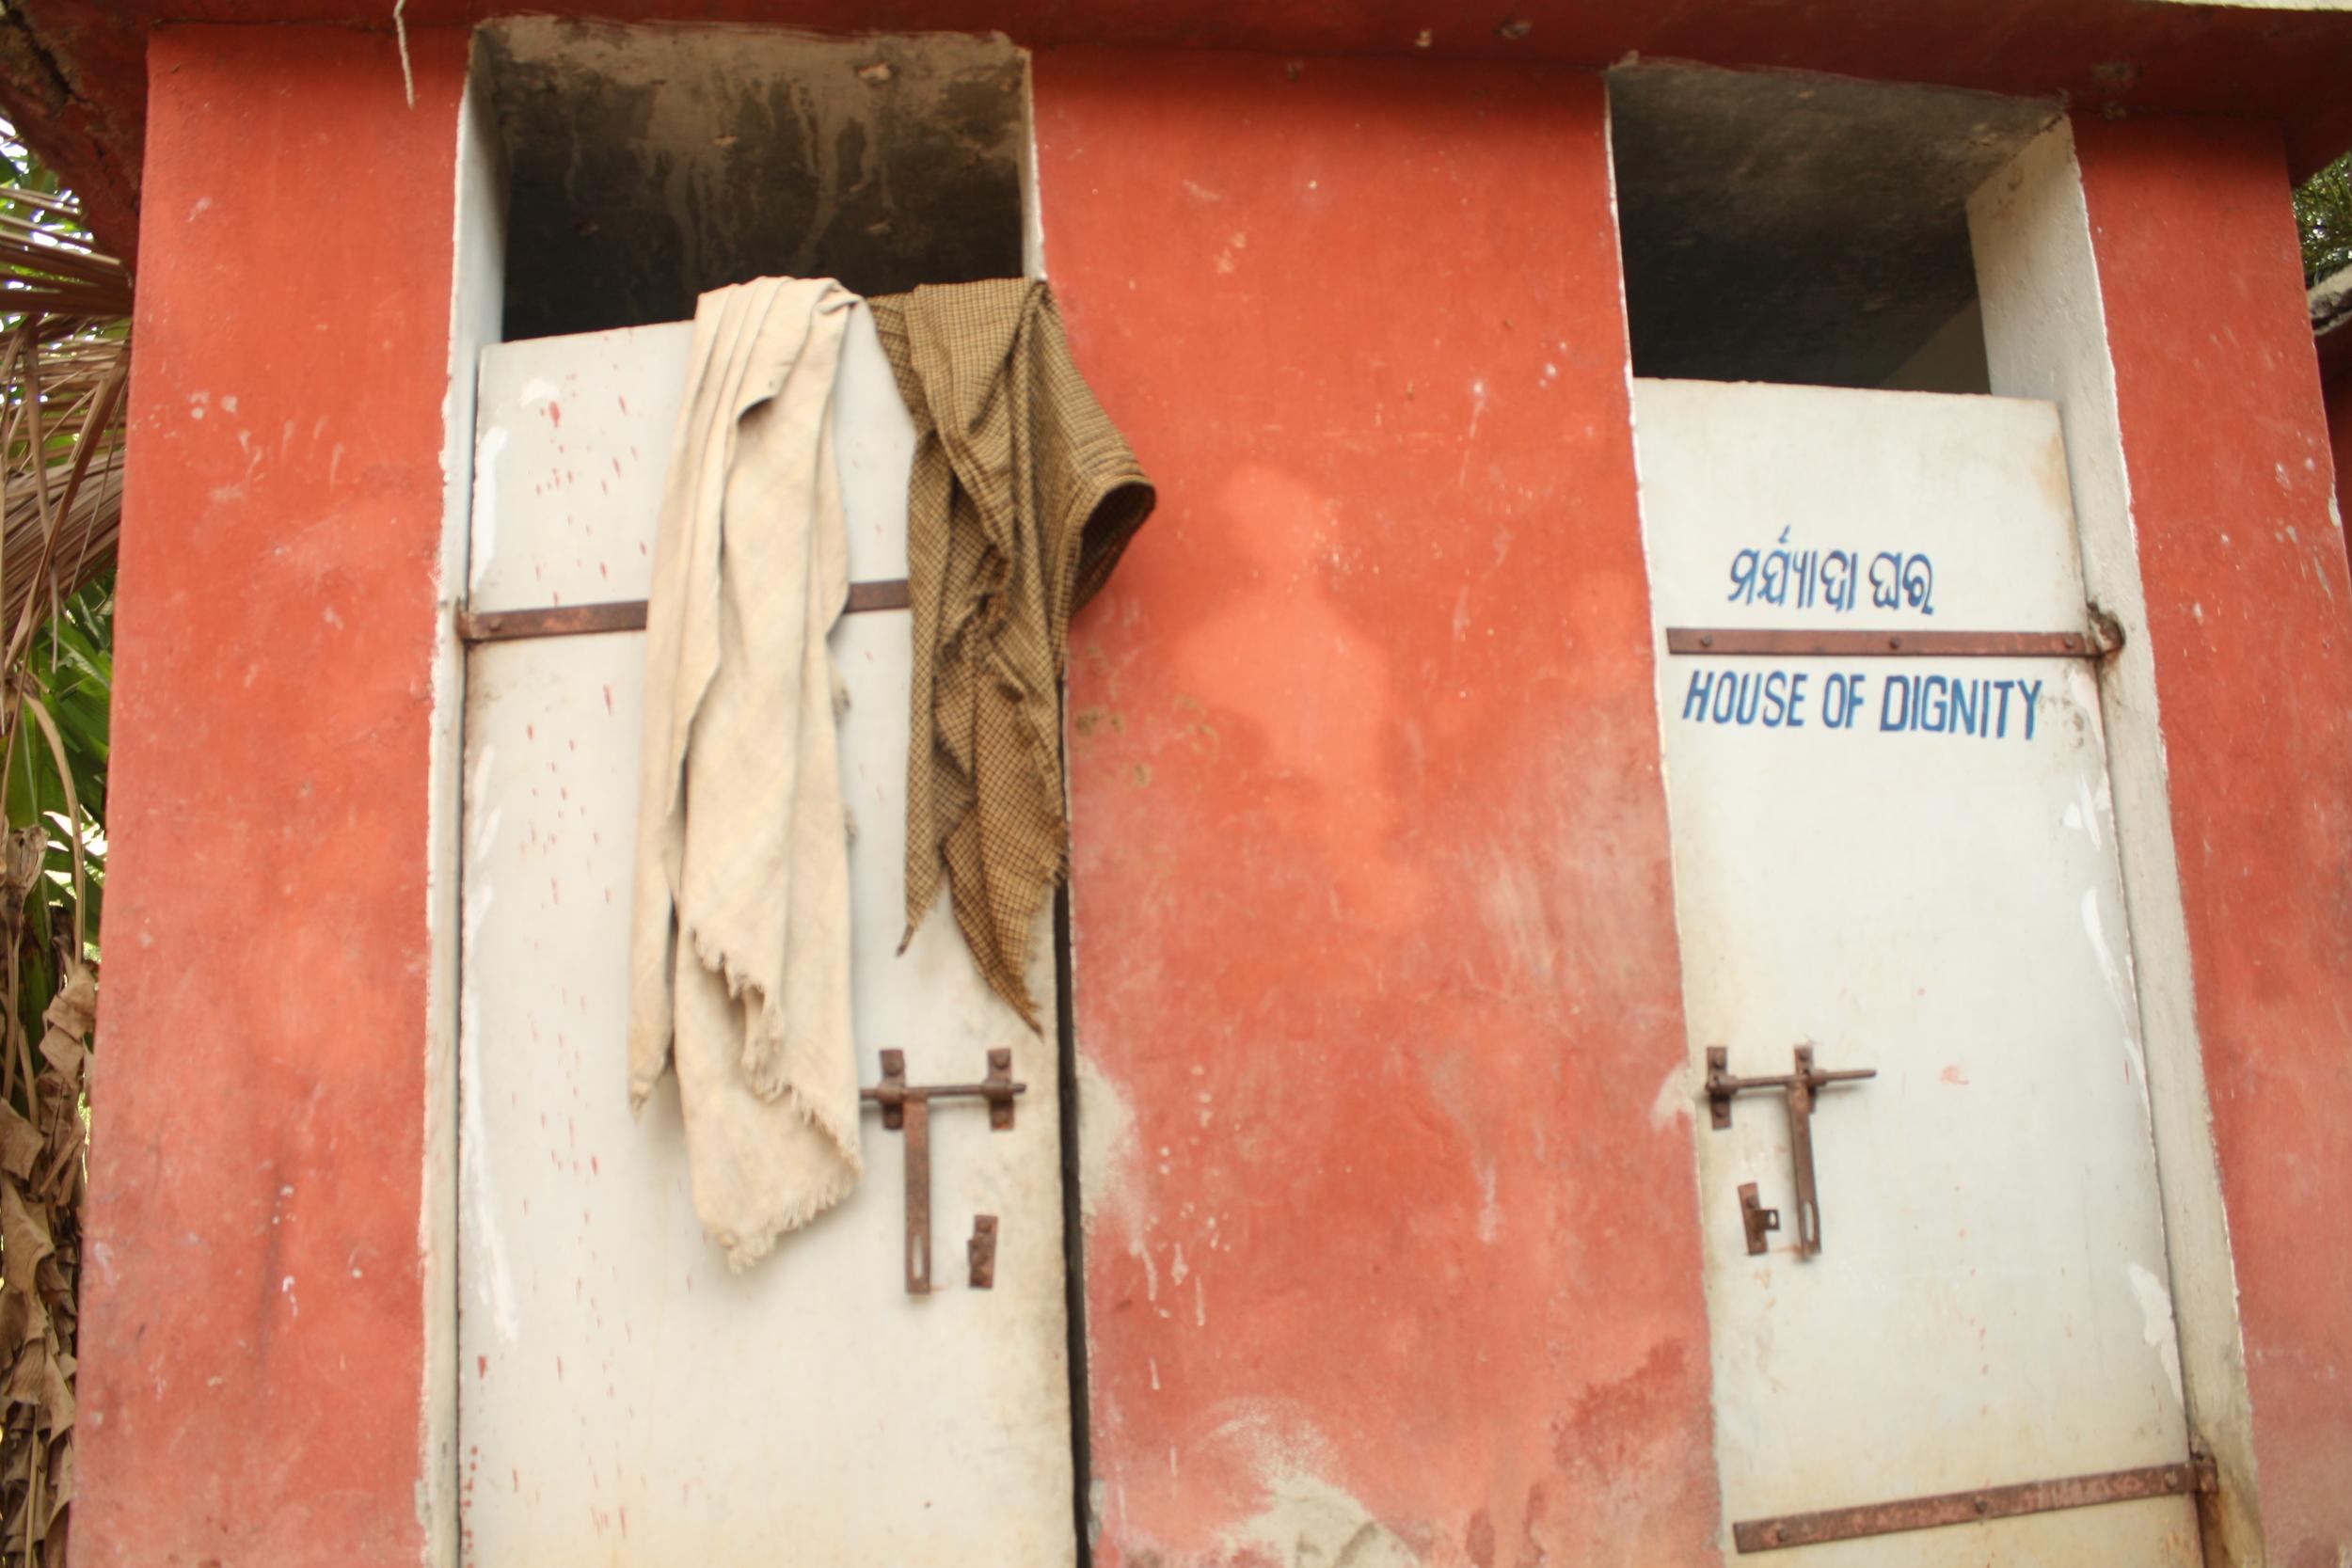 Toilet & Bathing Room in Village in Odisha